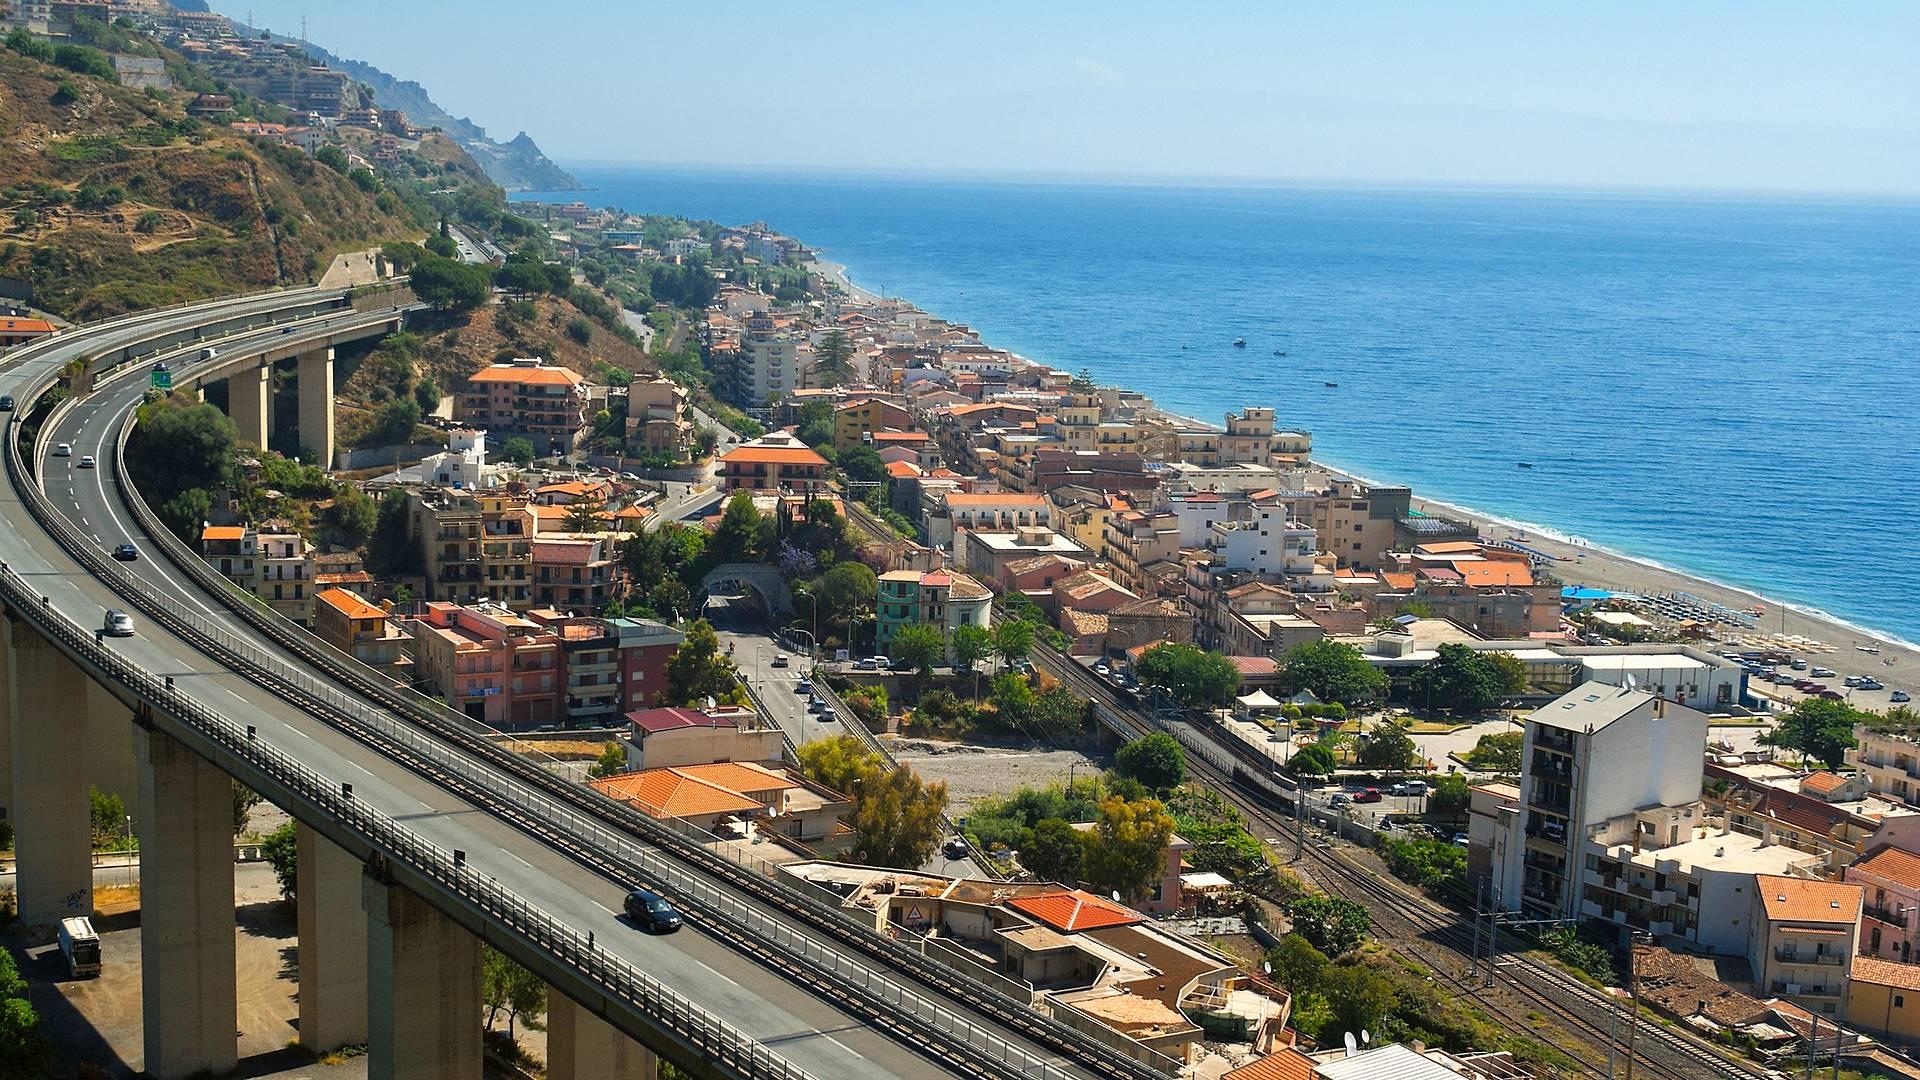 Gran tour de Sicilia en coche